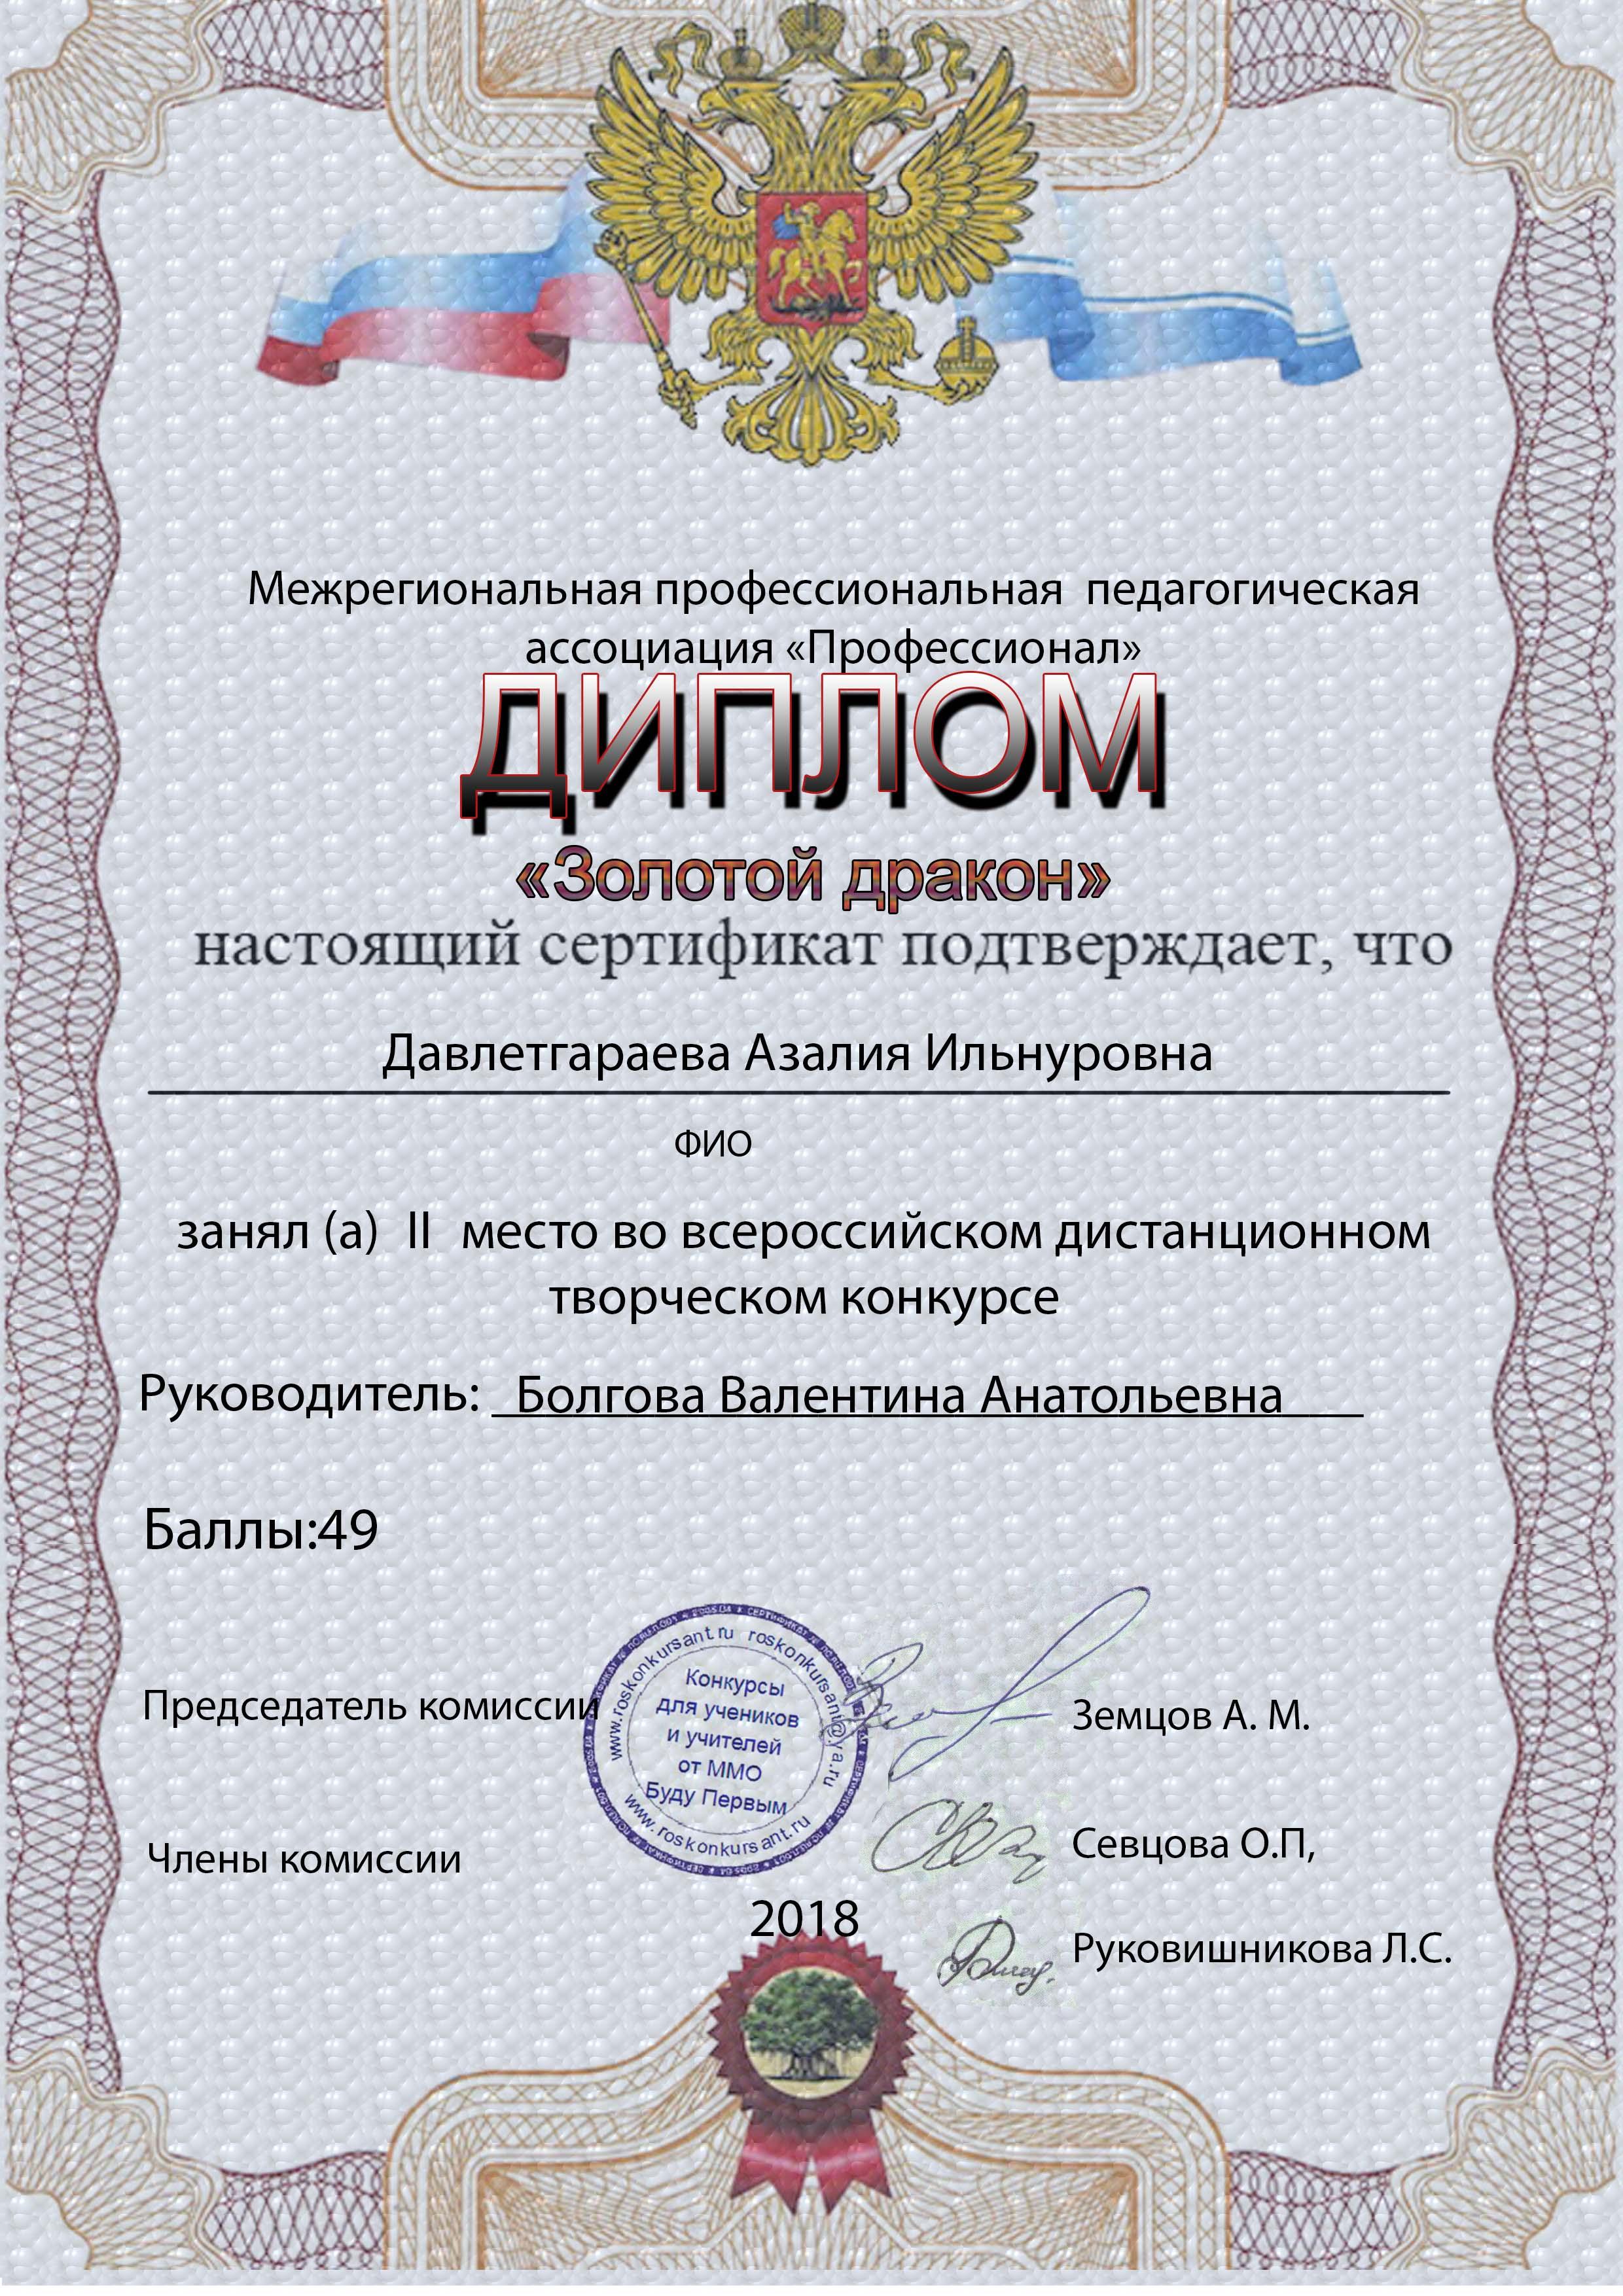 Давлетгараева Азалия Ильнуровна